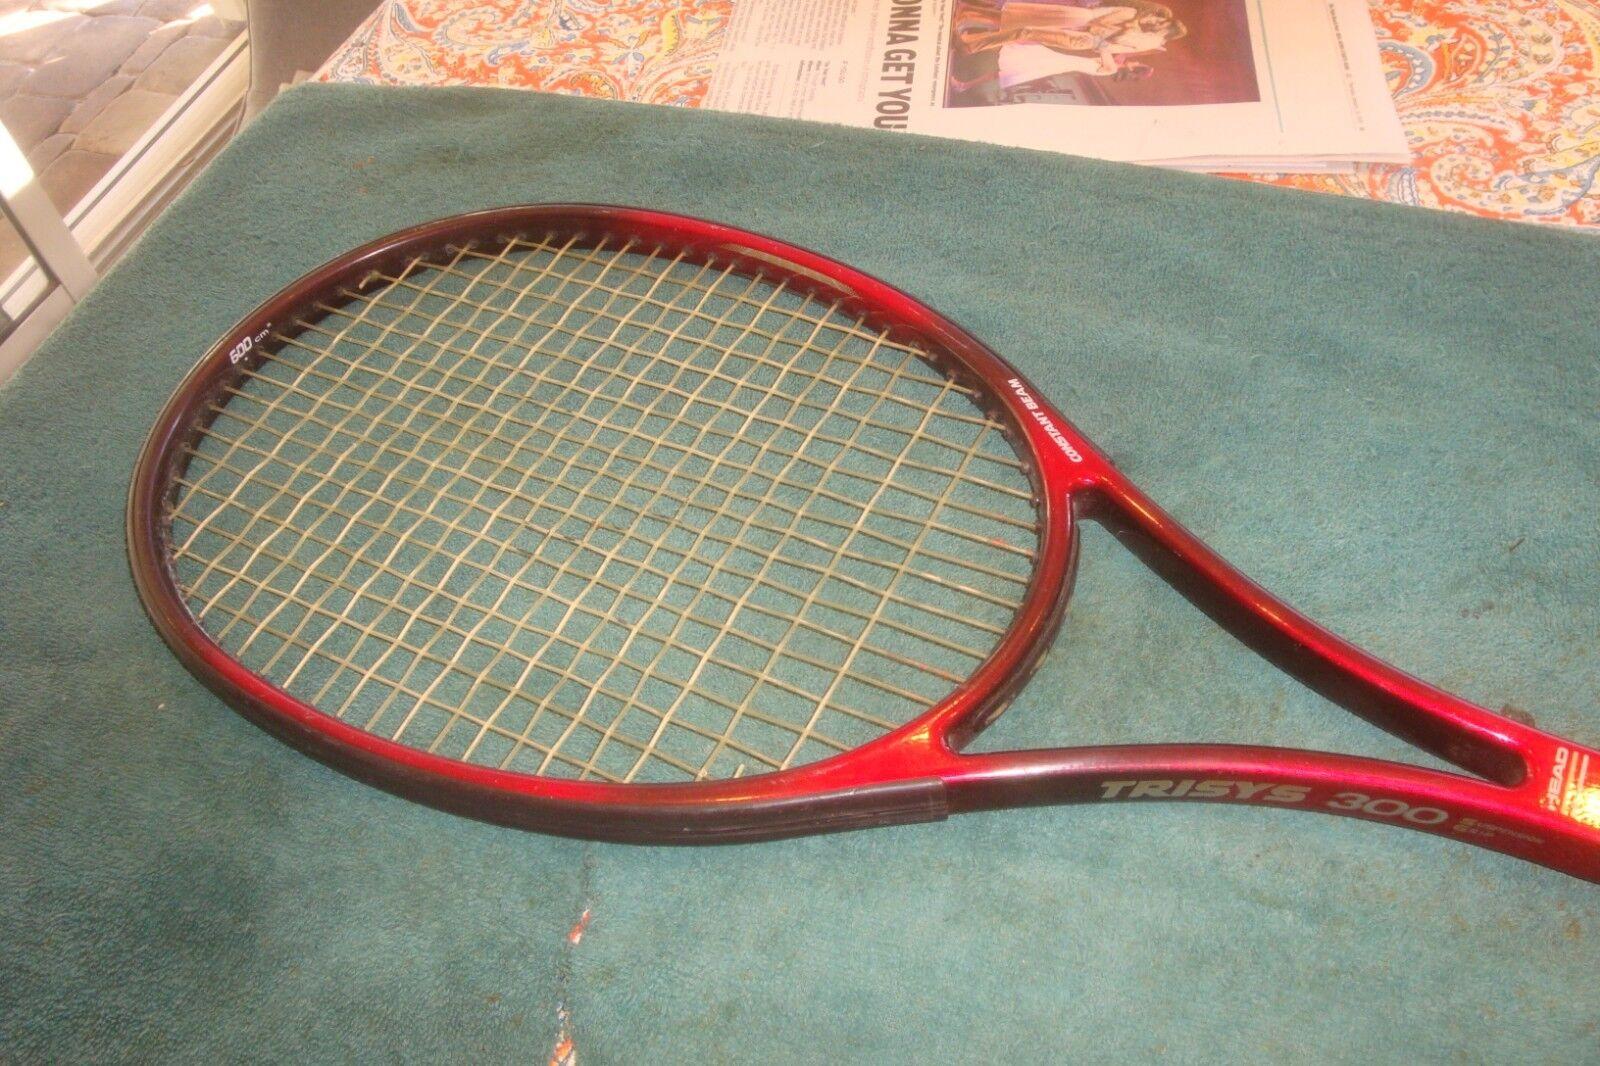 Head Trisys Prestige 300  Tennis Racquet 600 cm2 4 3 8  Grip made Austria